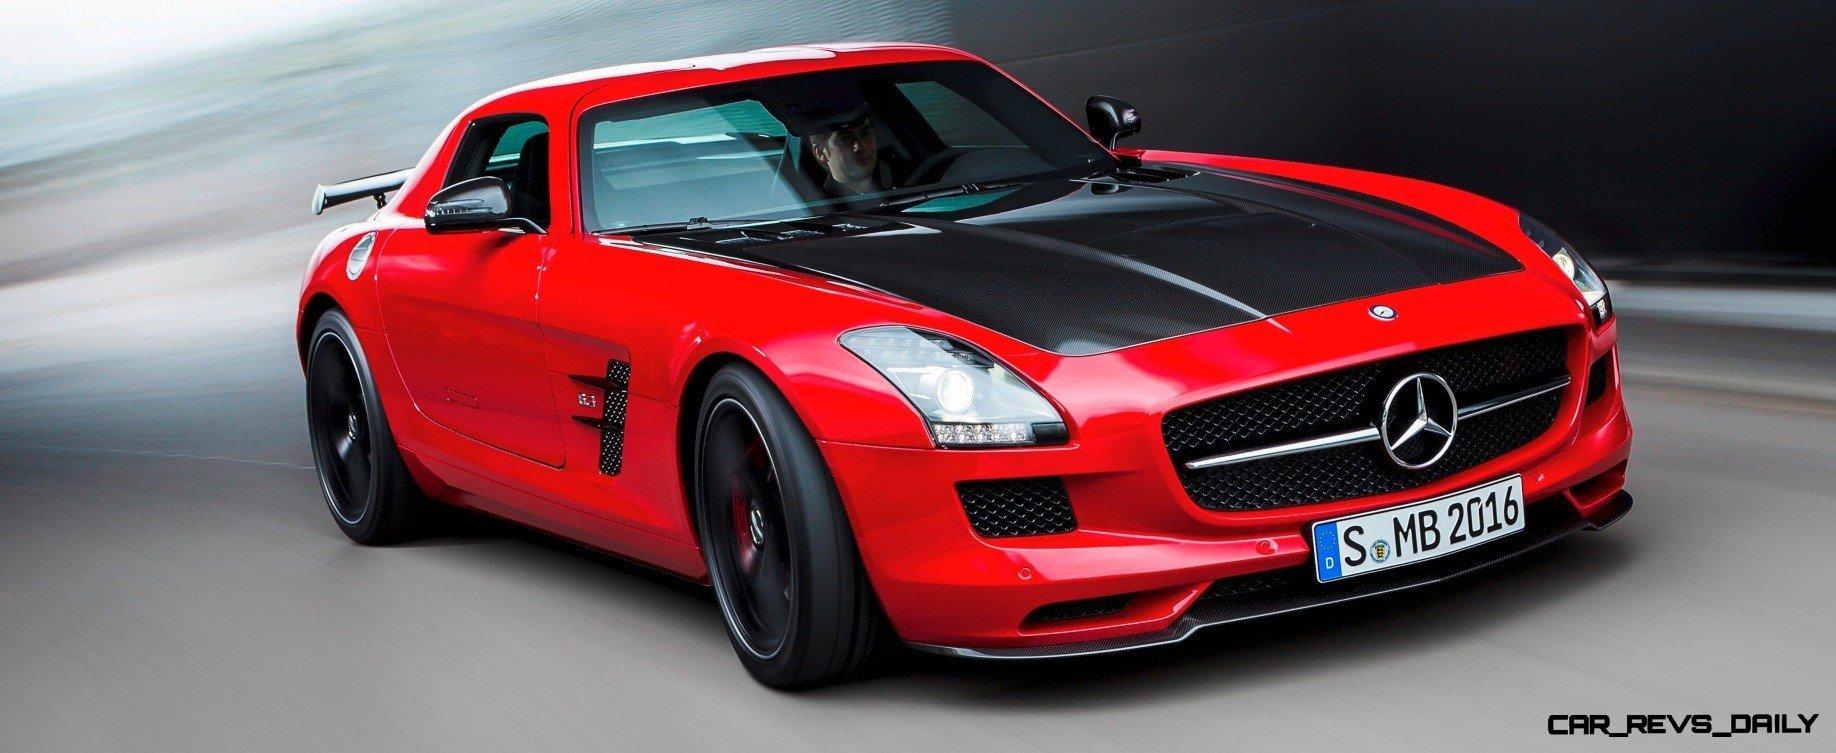 2015 SLS AMG GT FINAL EDITION